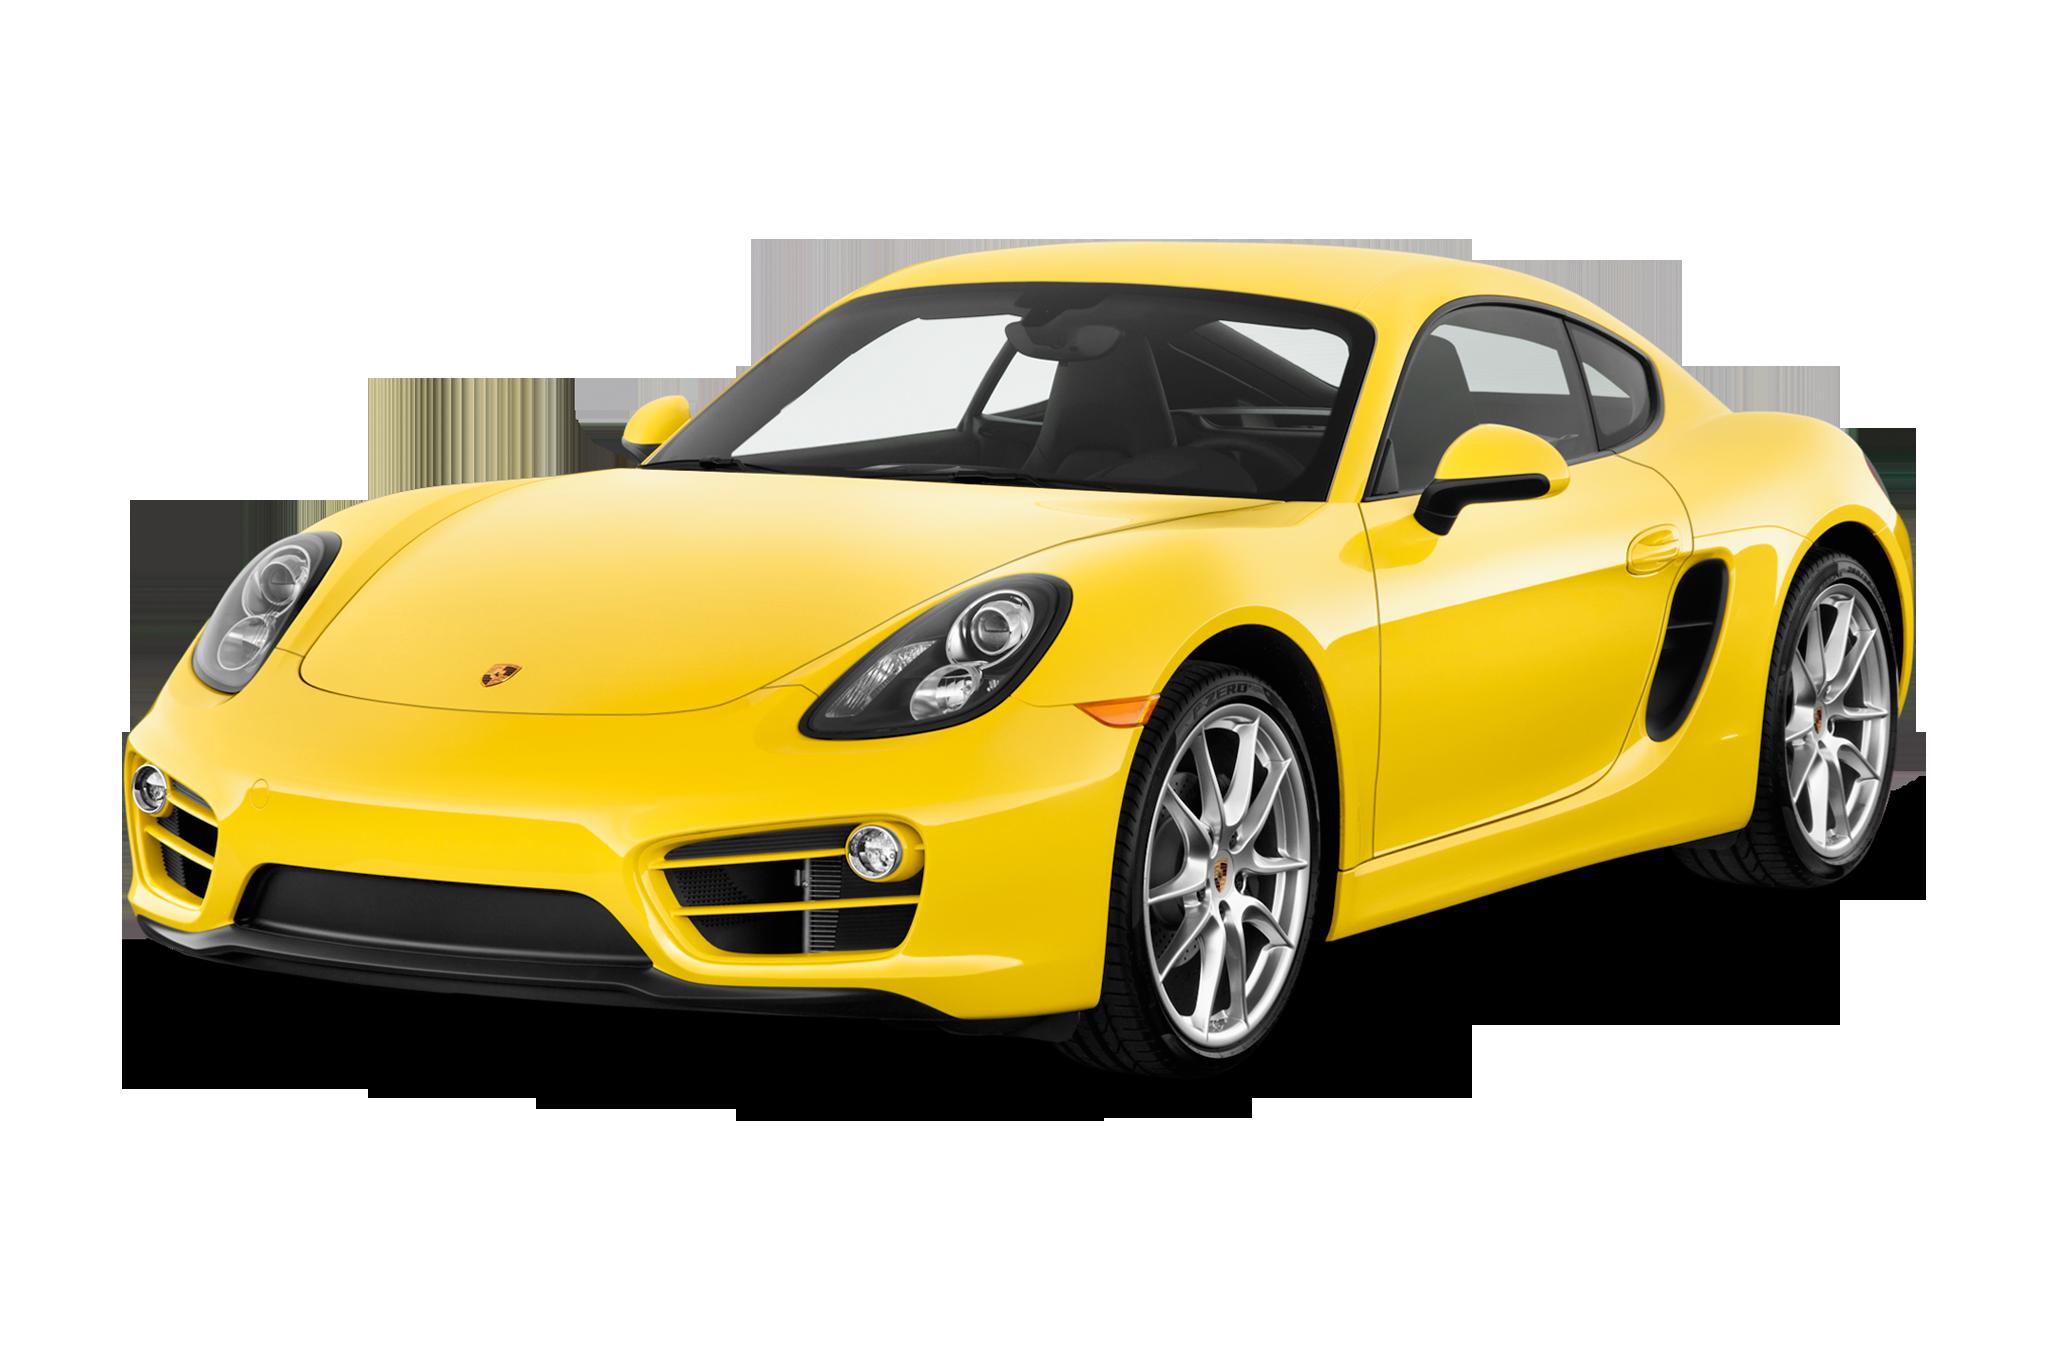 Porsche Hd Png Transparent Porsche Hd Png Images Pluspng